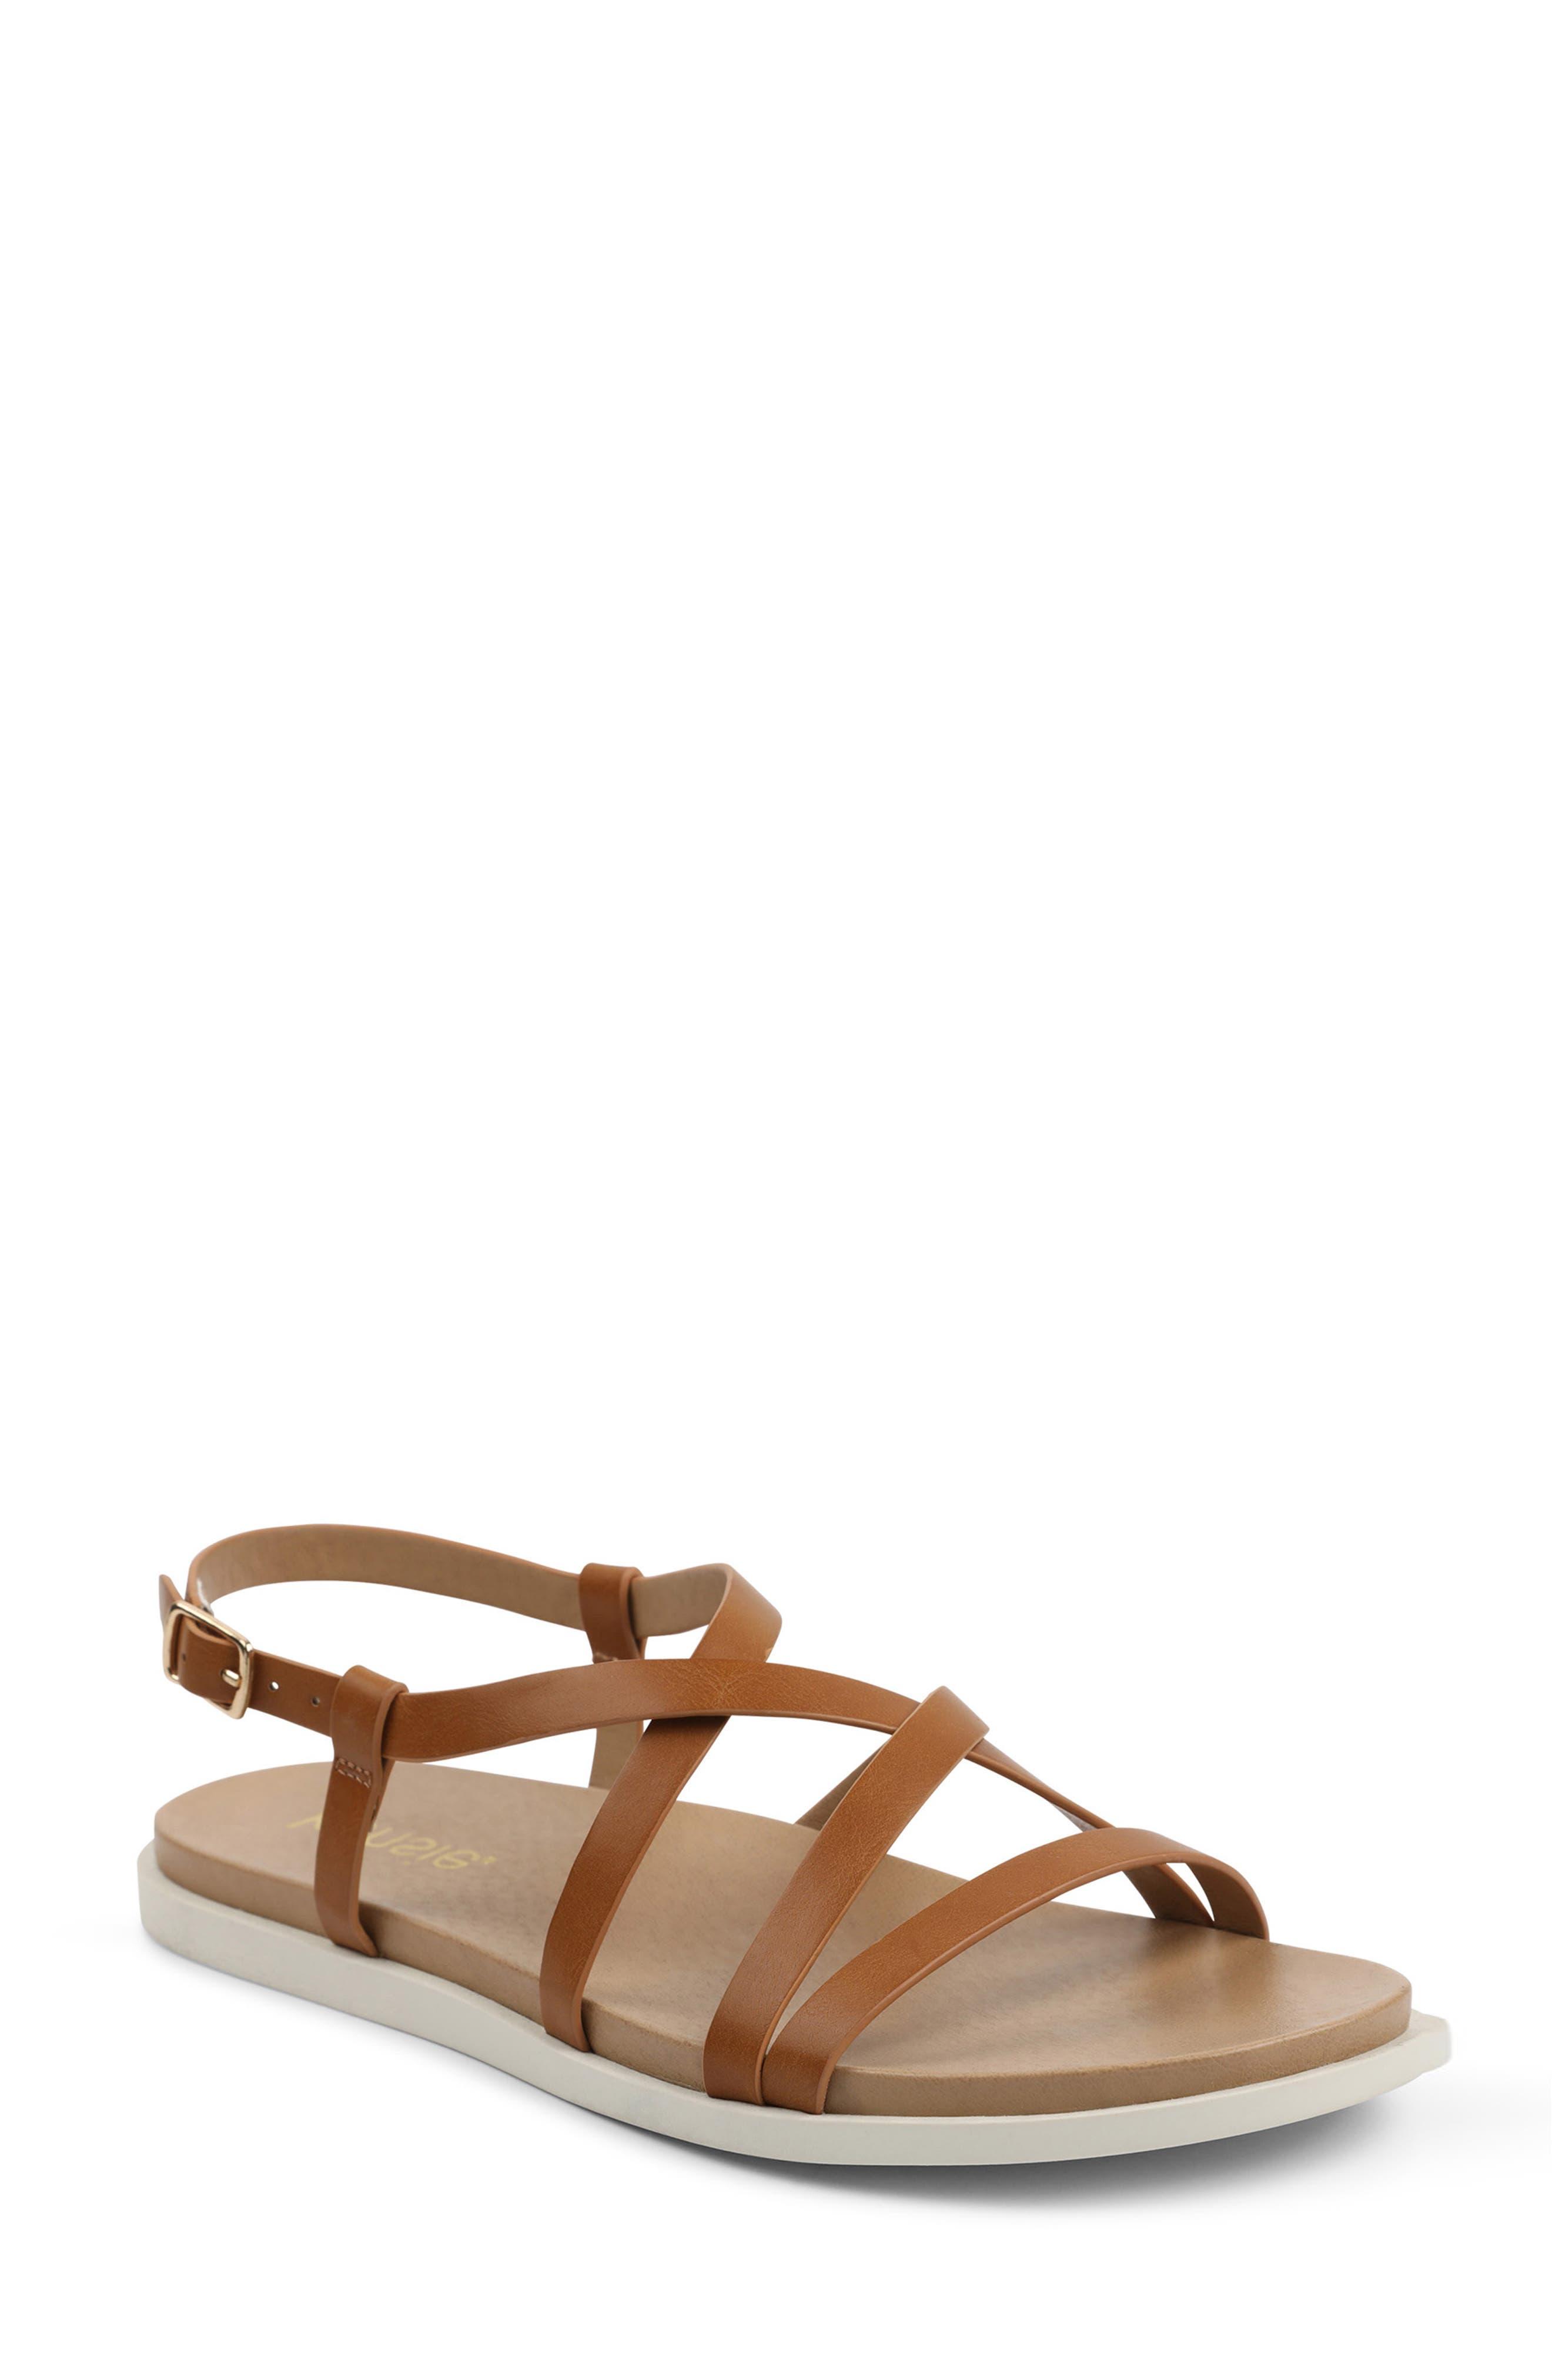 Idalia Strappy Sandal